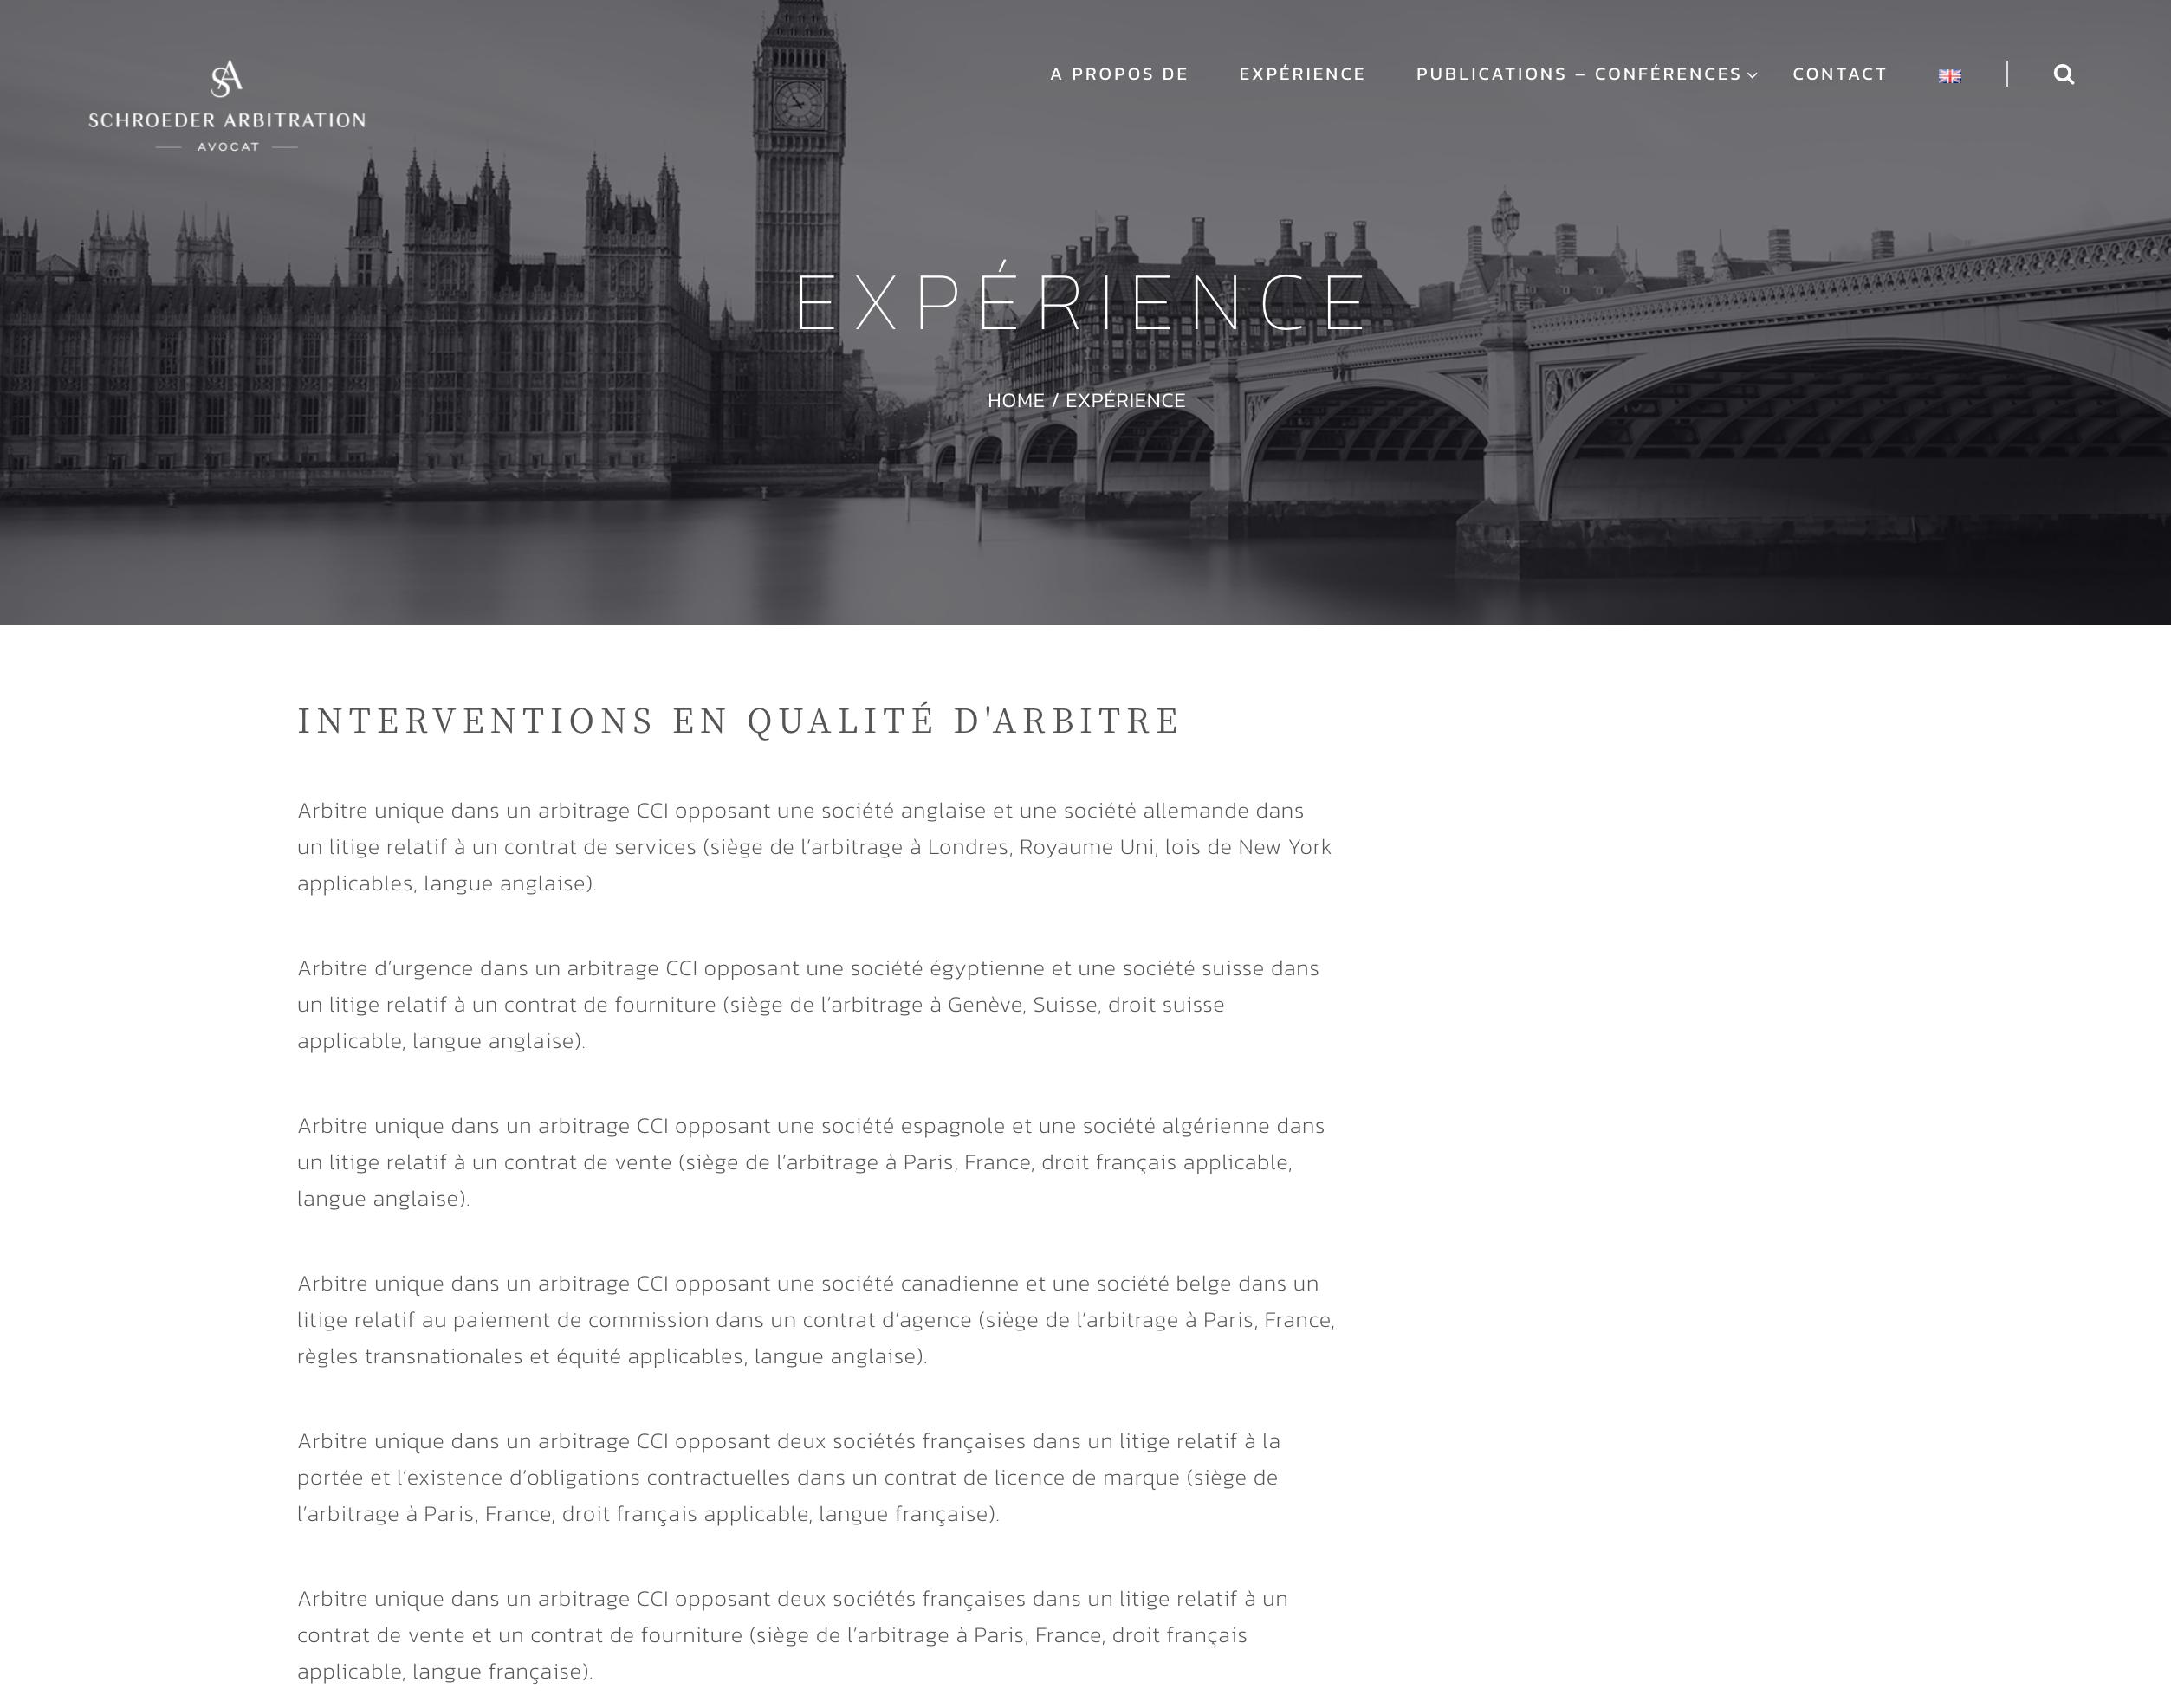 schroeder-arbitration.com- experience - studio421